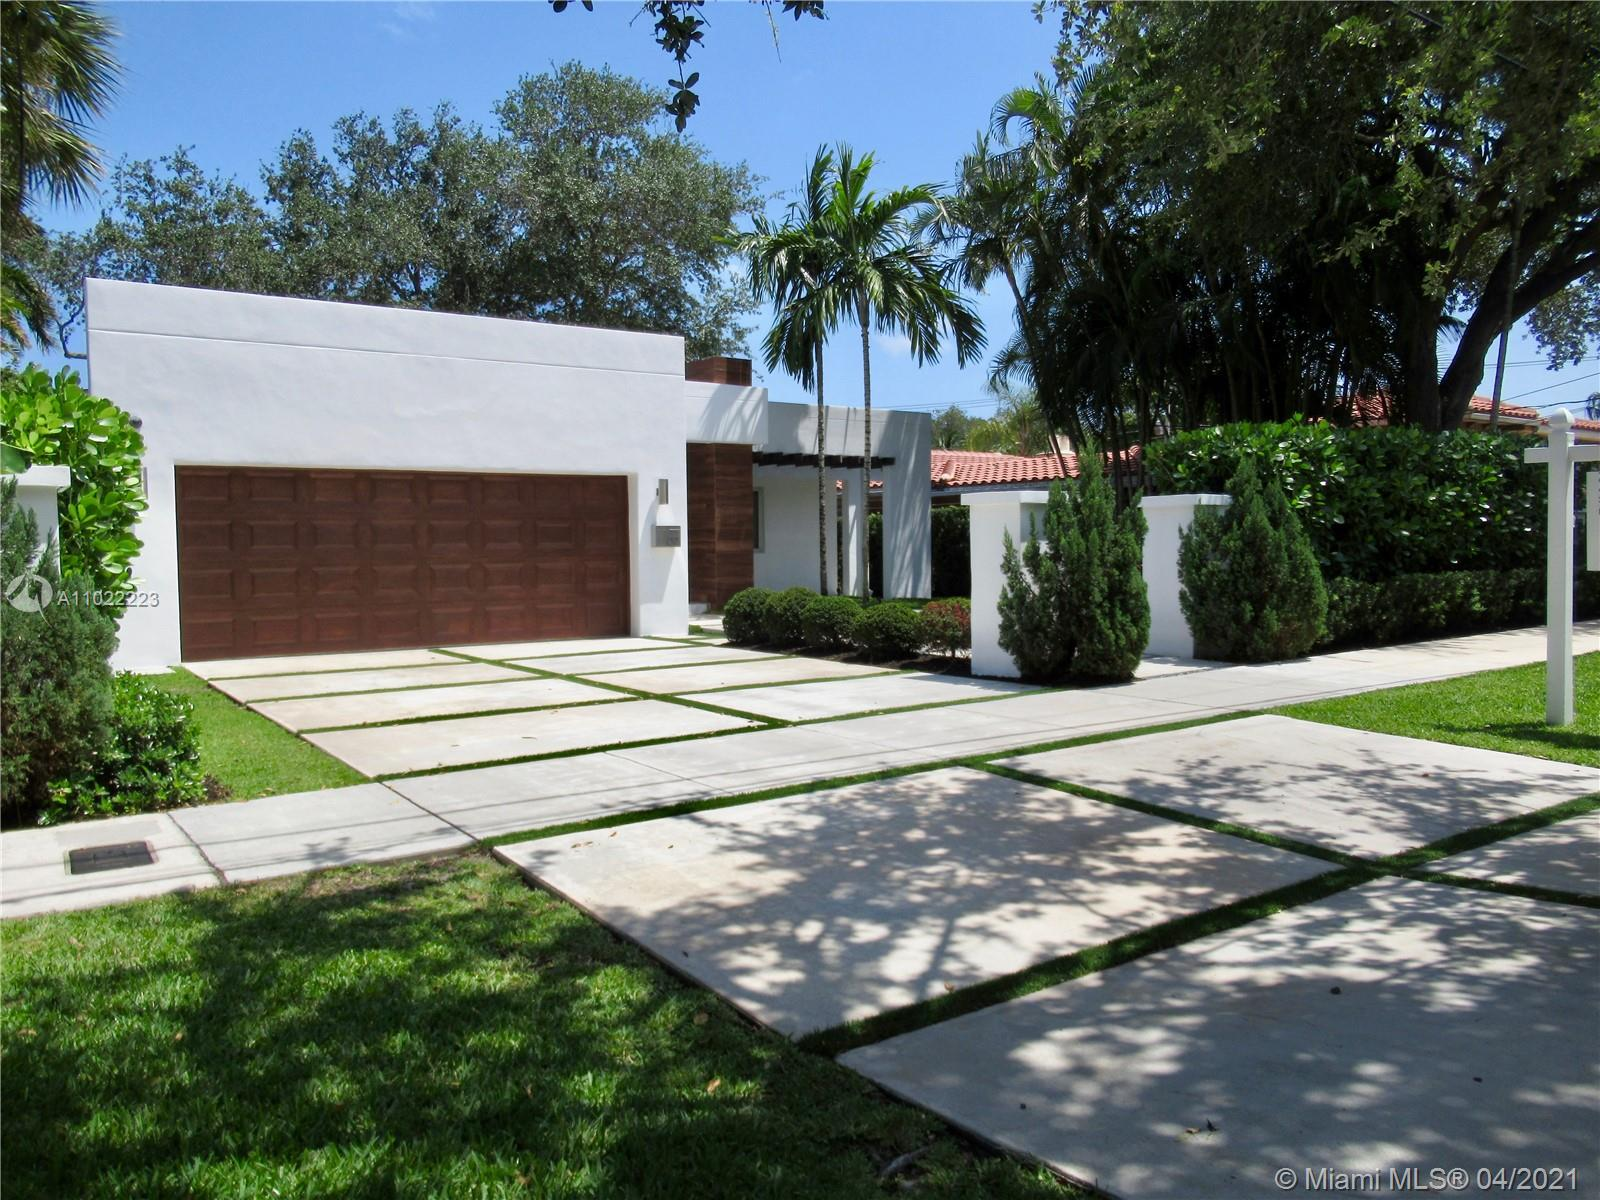 Rio Vista - 1315 N Rio Vista Blvd, Fort Lauderdale, FL 33316